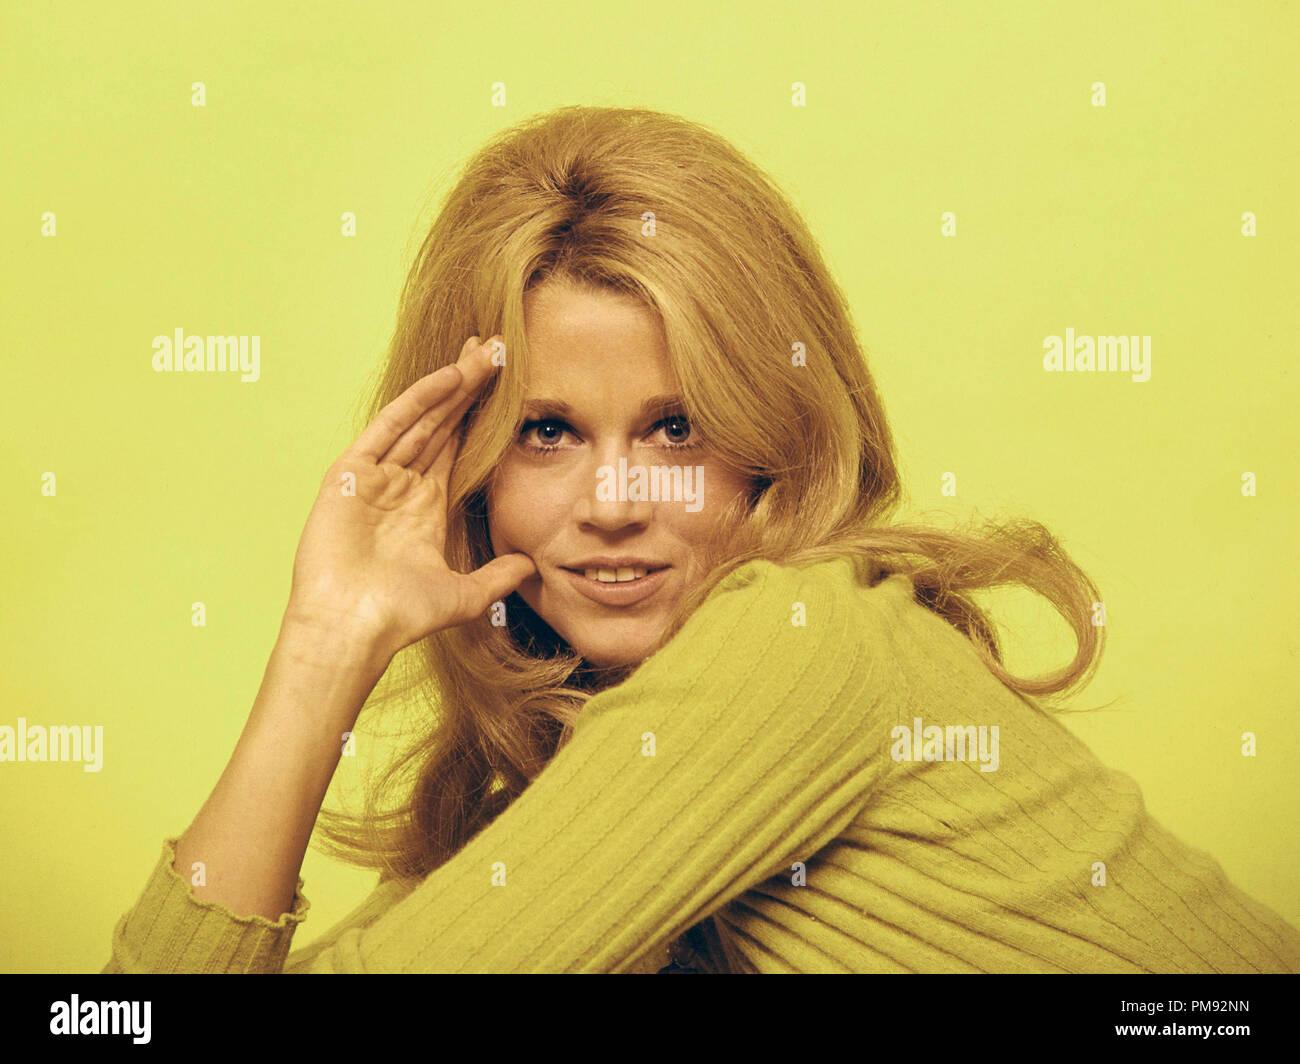 (Archivierung klassische Kino - Jane Fonda Retrospektive) Jane Fonda, circa 1969. Datei Referenz # 31537_281 THA Stockbild